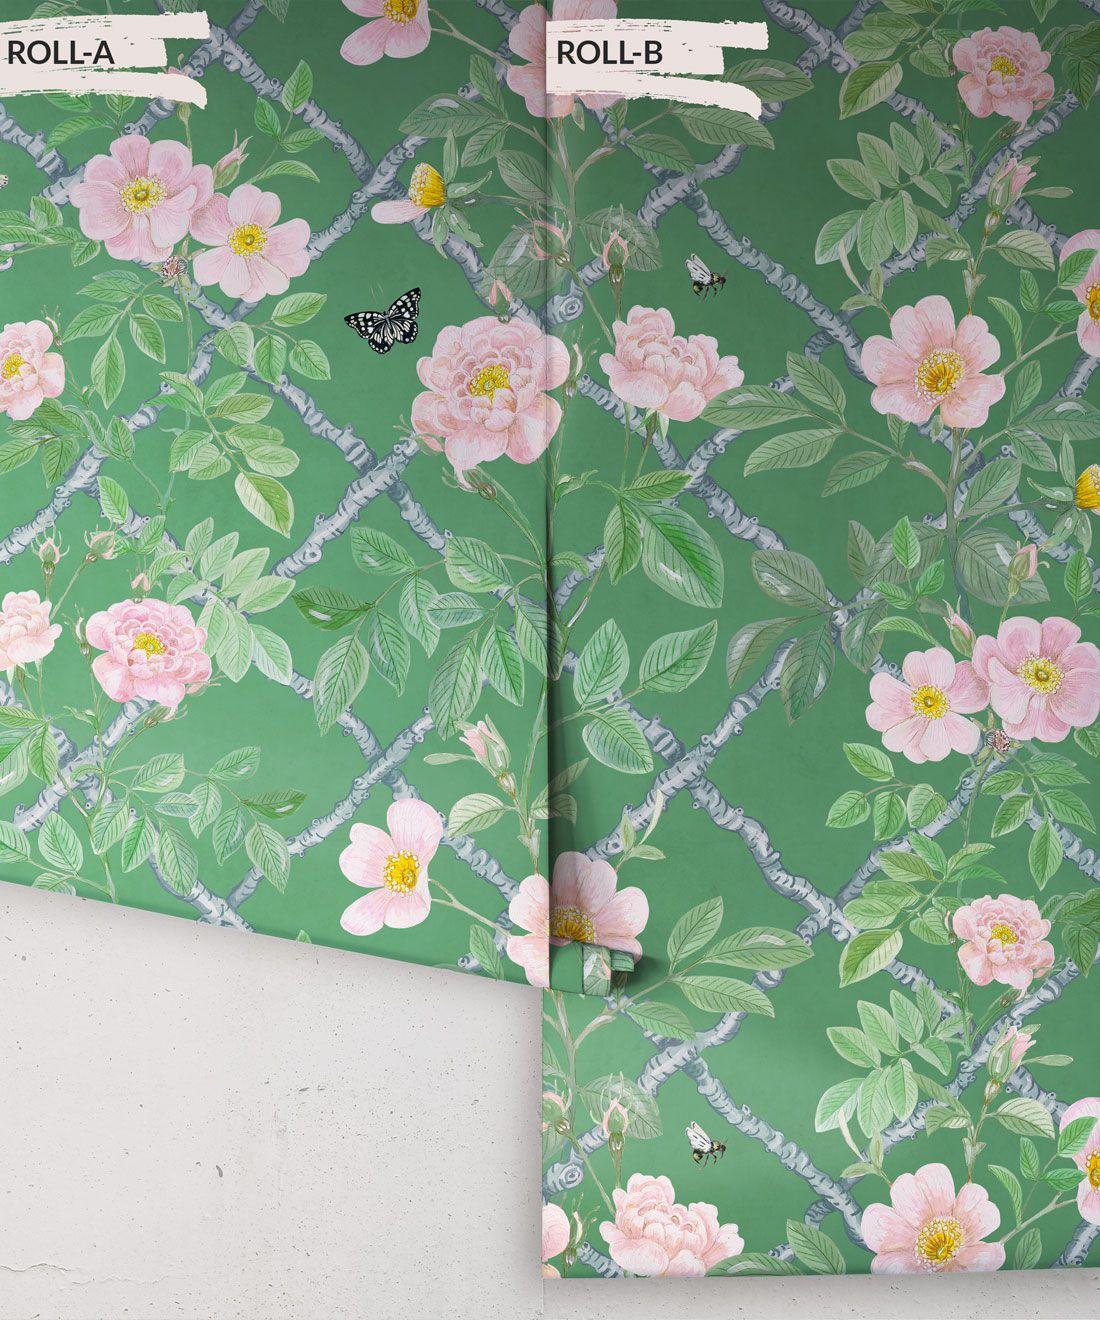 Treilage Wallpaper • Floral Wallpaper • Forest Green • Rolls